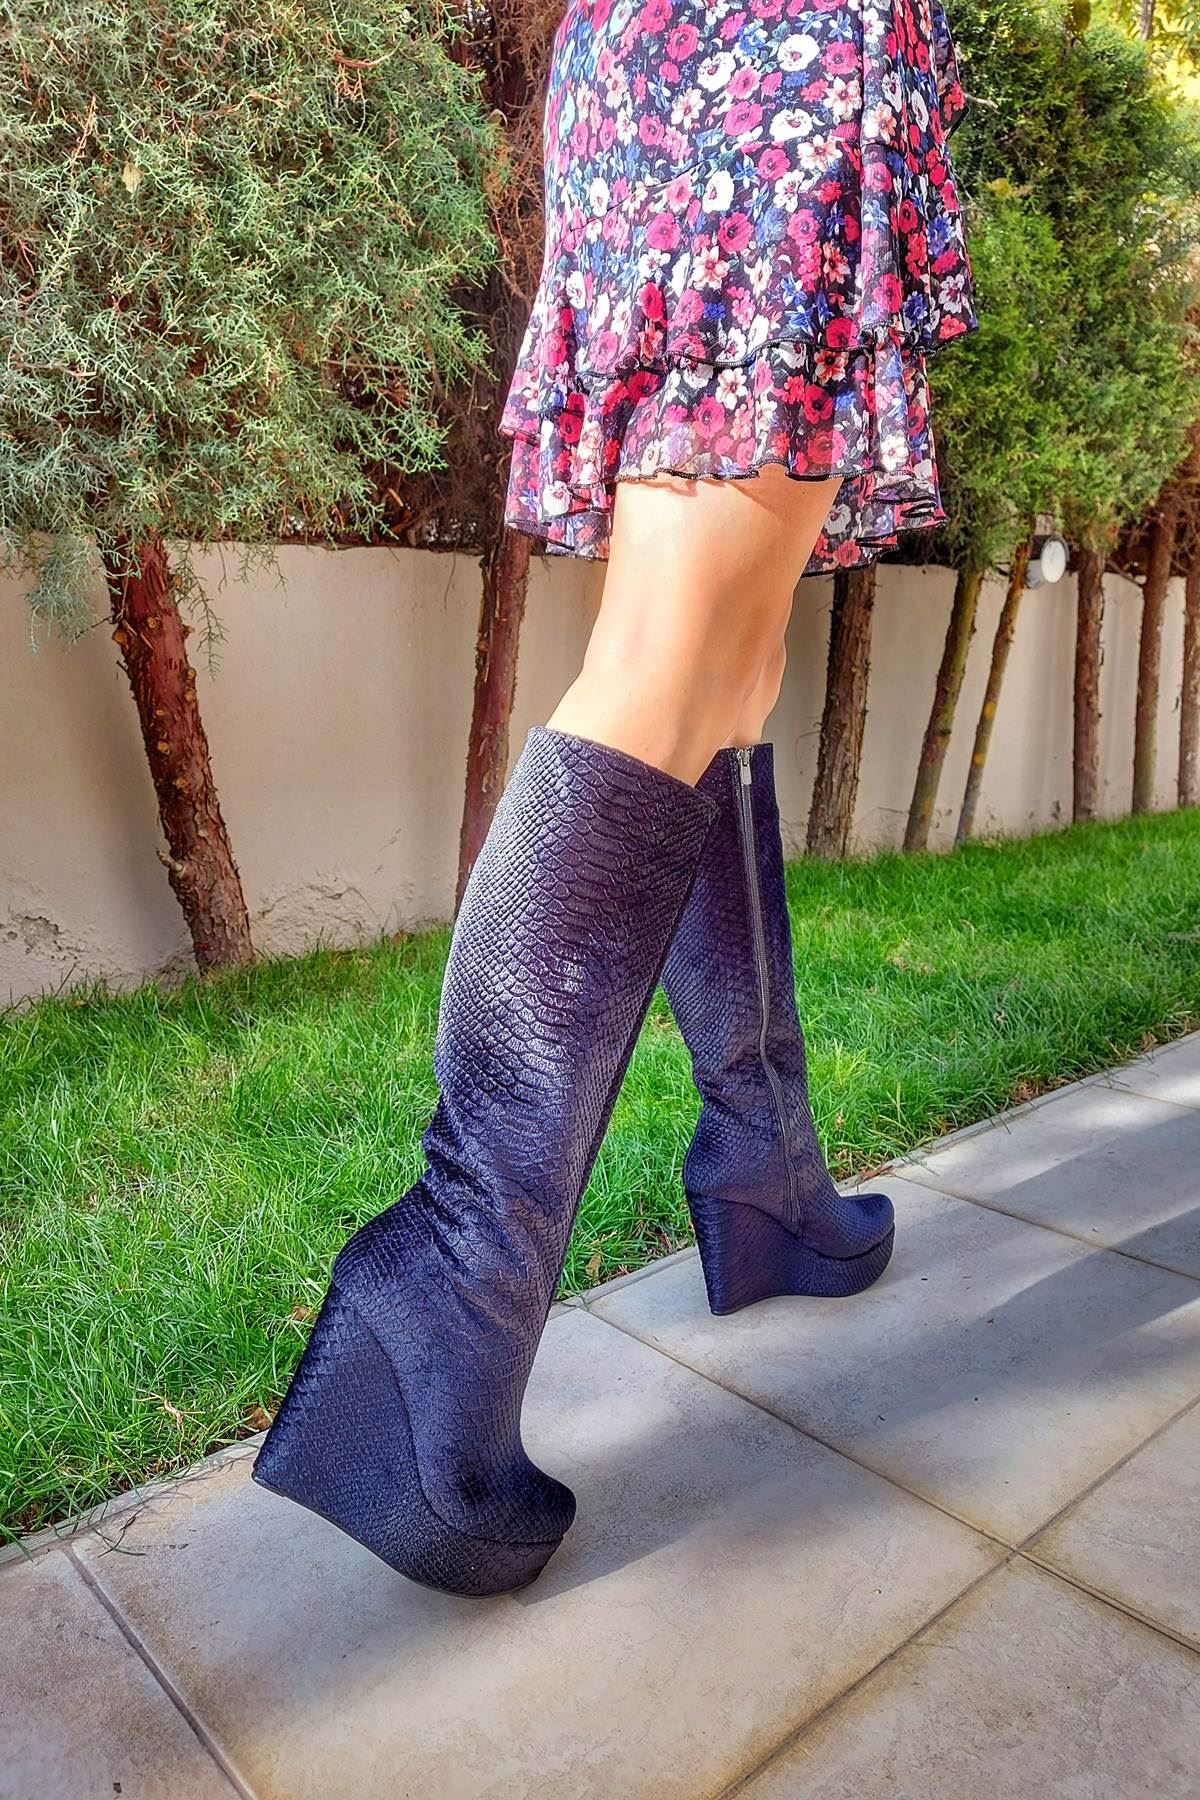 Kelly Siyah Kadife Dolgu Topuklu Çizme